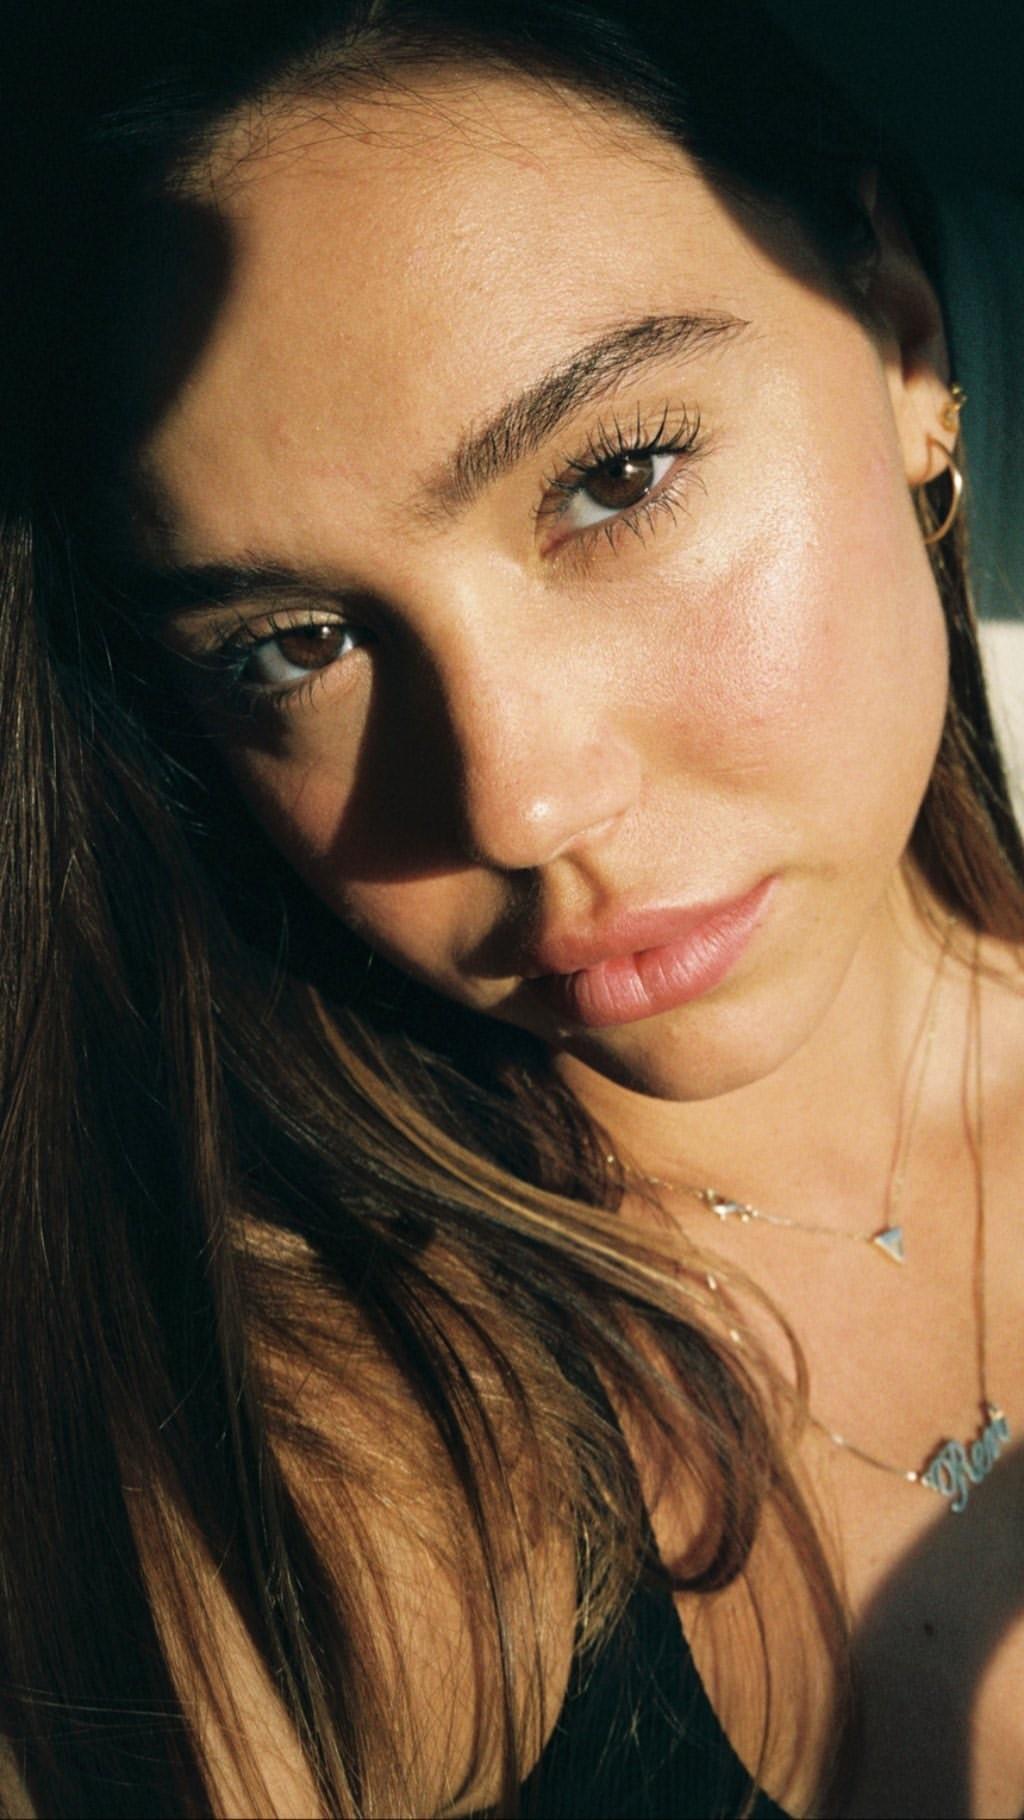 Alexis Ren Sexy Photoshoot